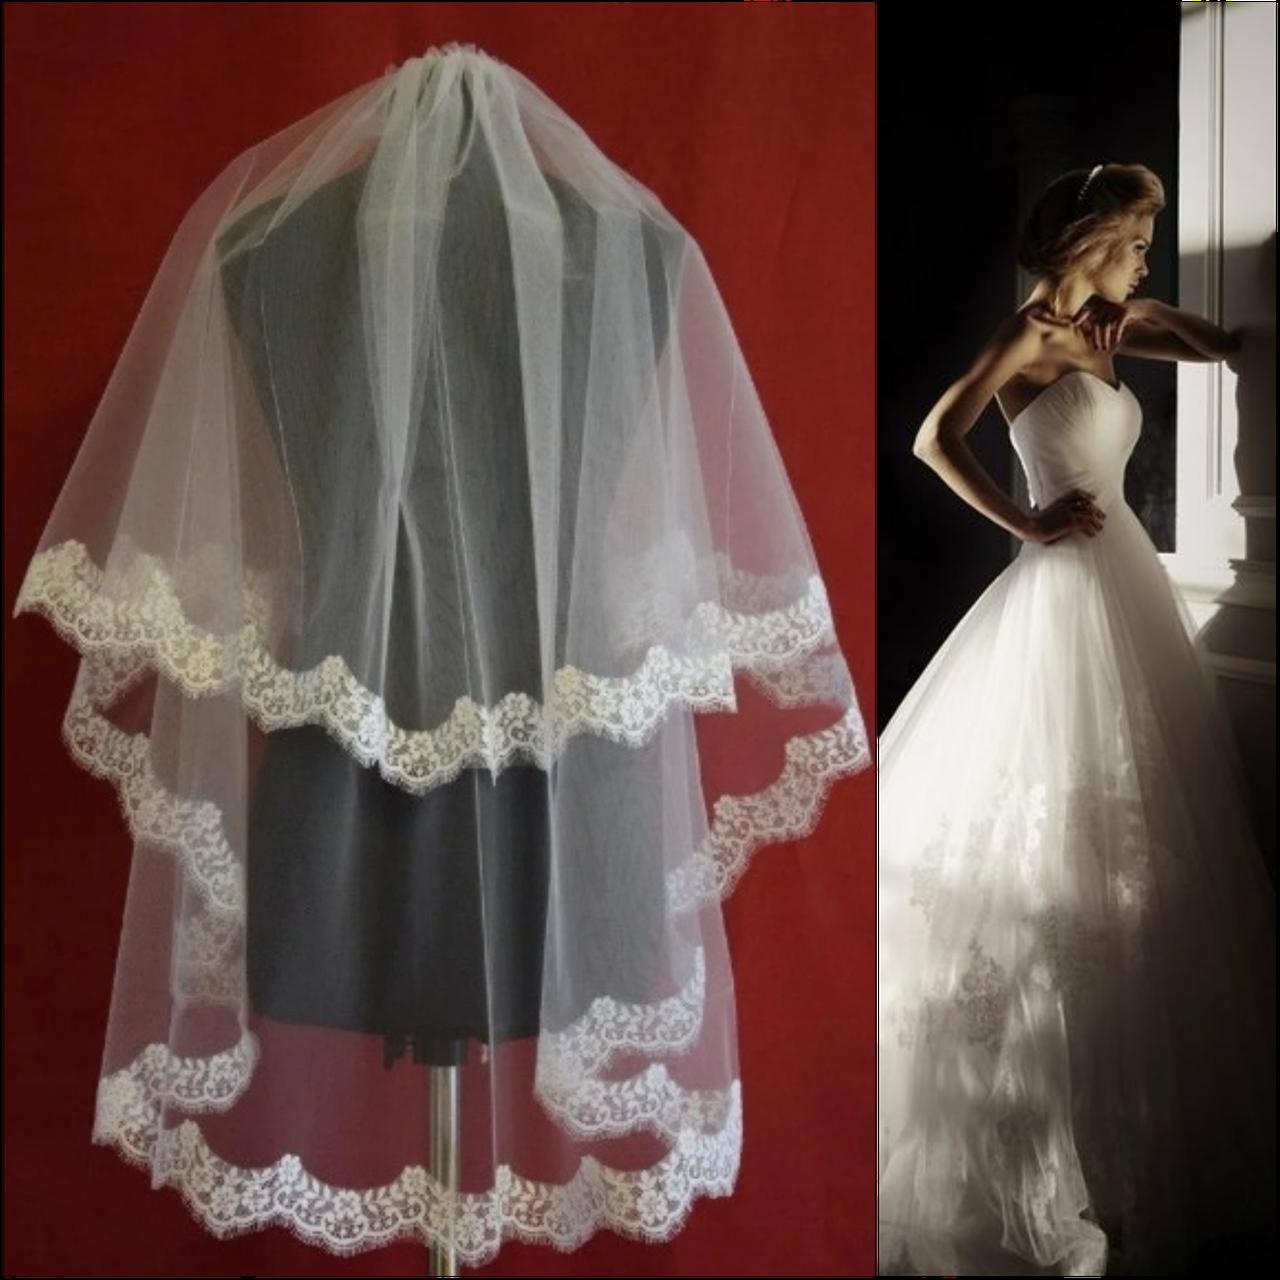 Двухъярусная свадебная Фата с кружевом шантильи SF для Невесты белая (sf-061)